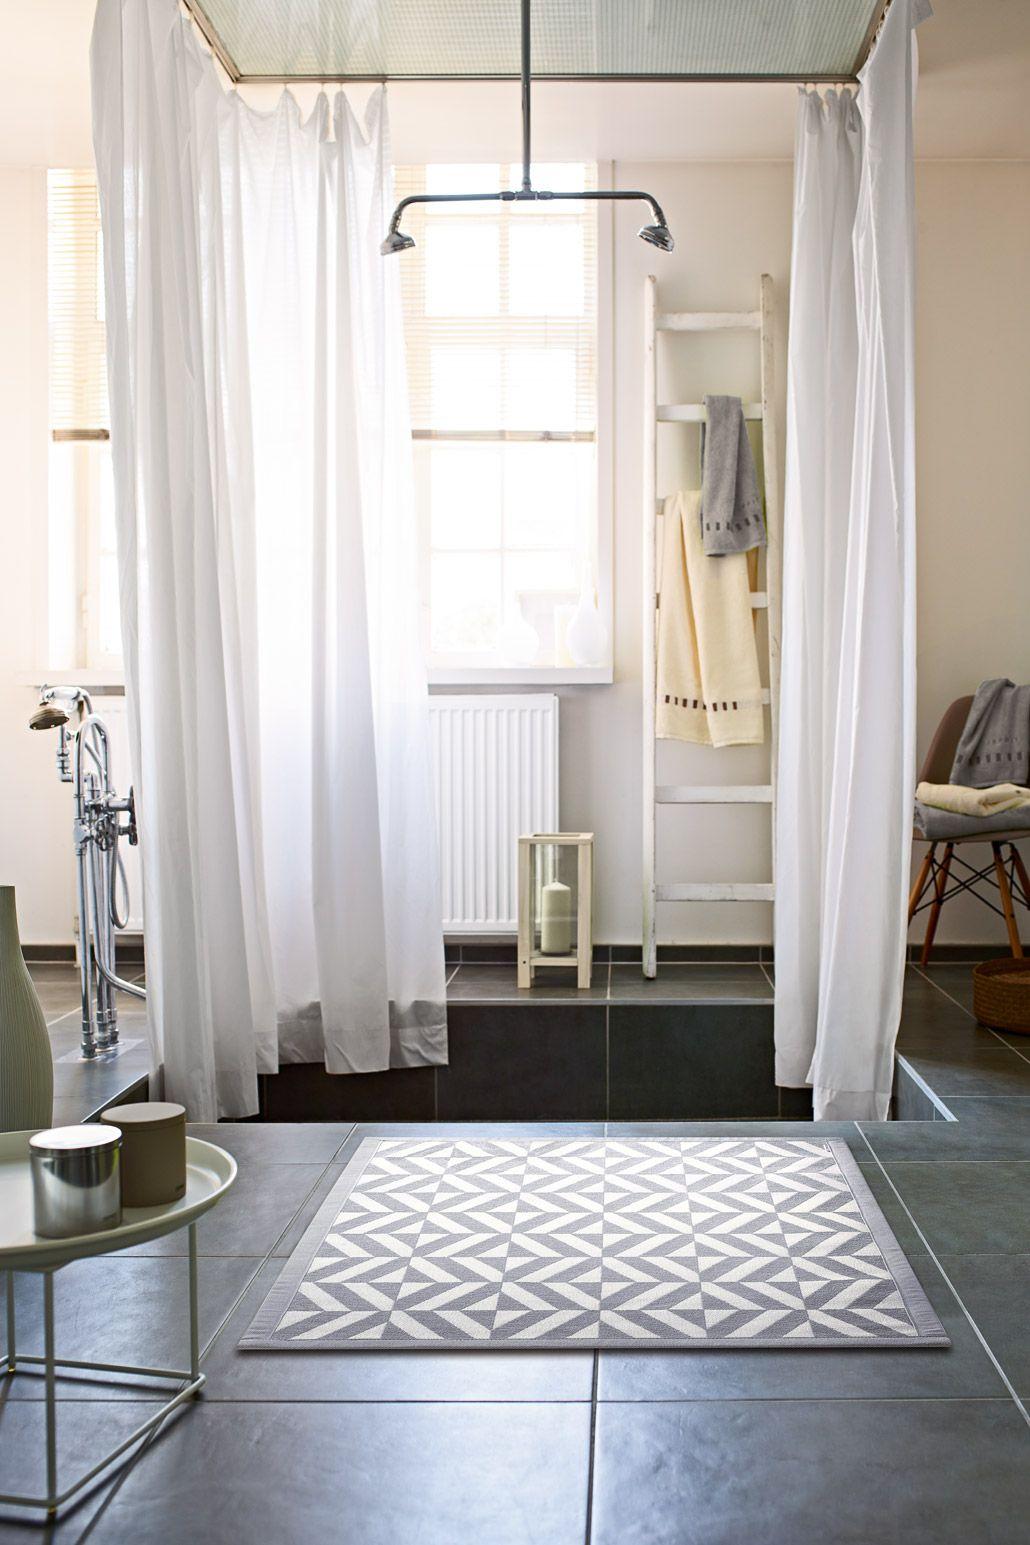 Teppich Badezimmer Cheap Badezimmer Teppich Badezimmer